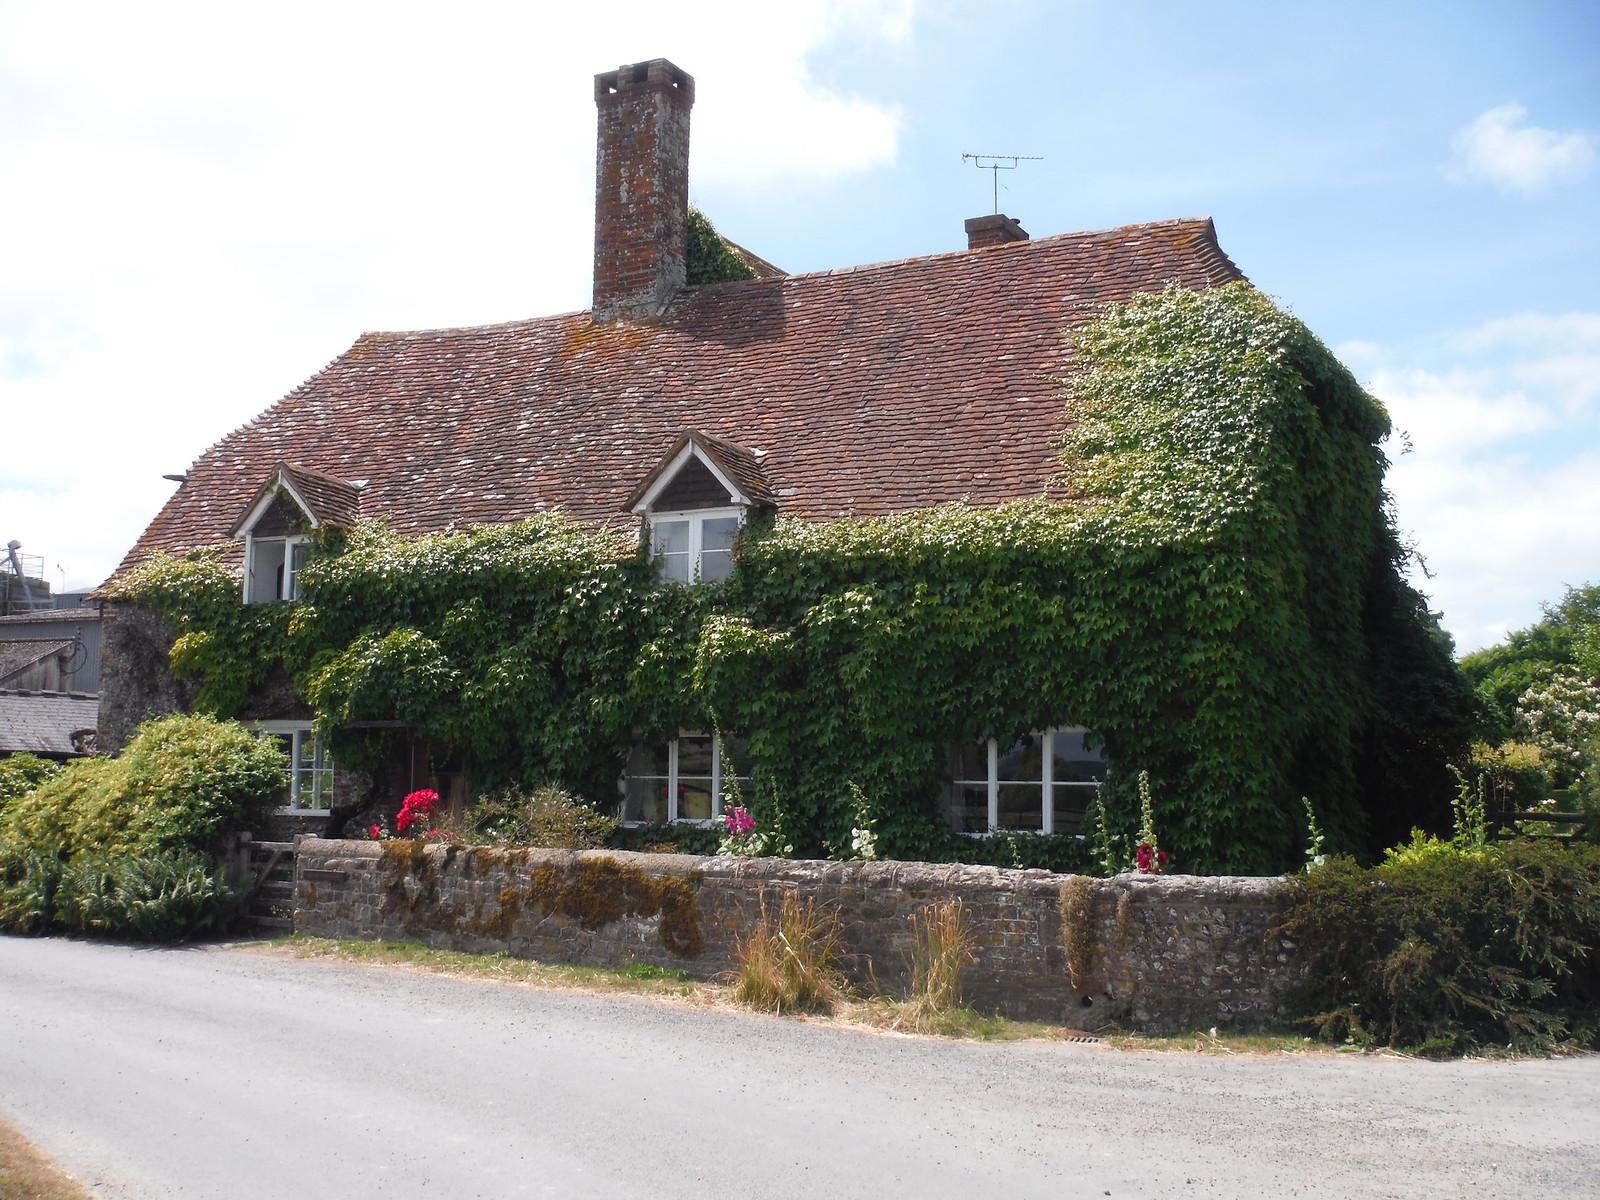 House in Bignor SWC Walk 217 Midhurst Way: Arundel to Midhurst